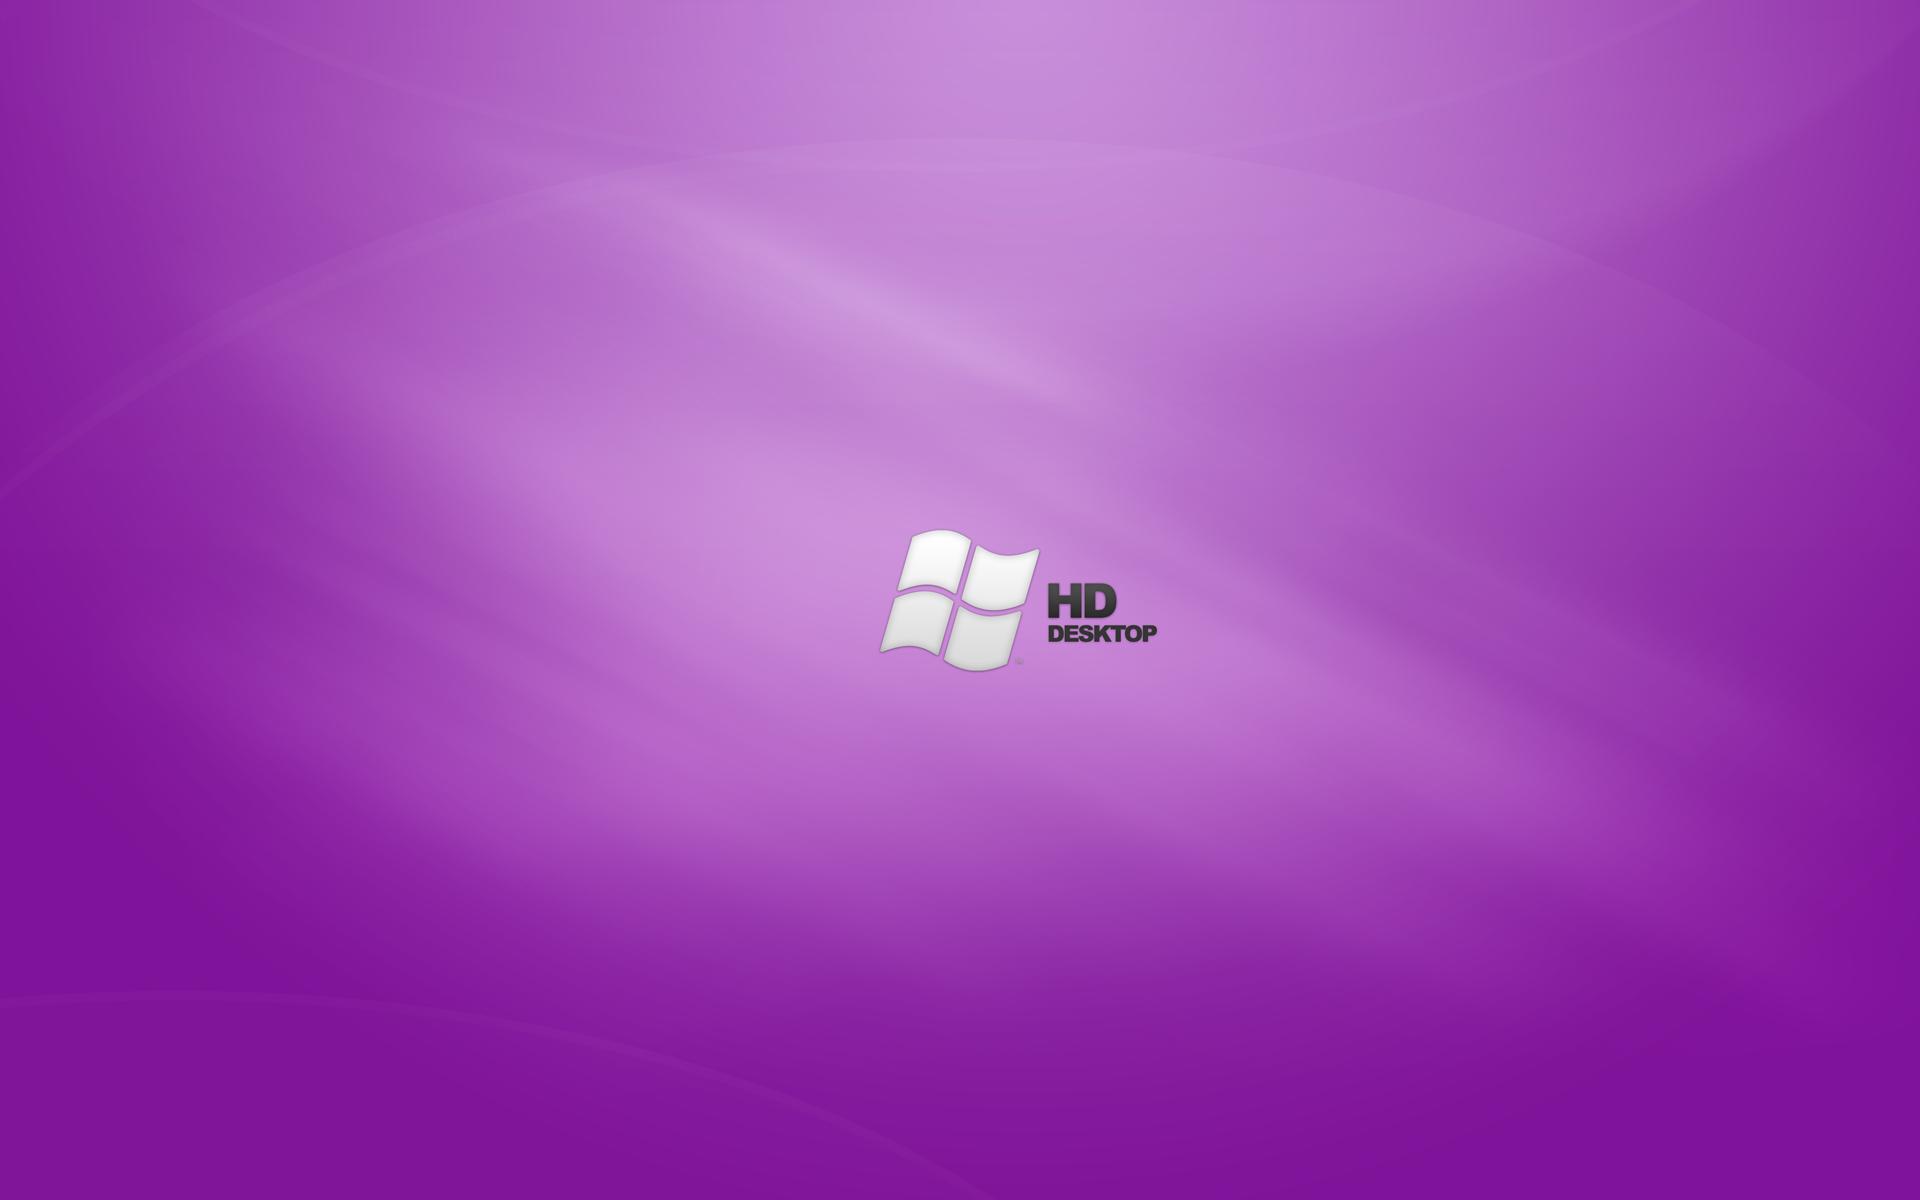 Windows Vista Wallpaper Set 16 Awesome Wallpapers 1920x1200